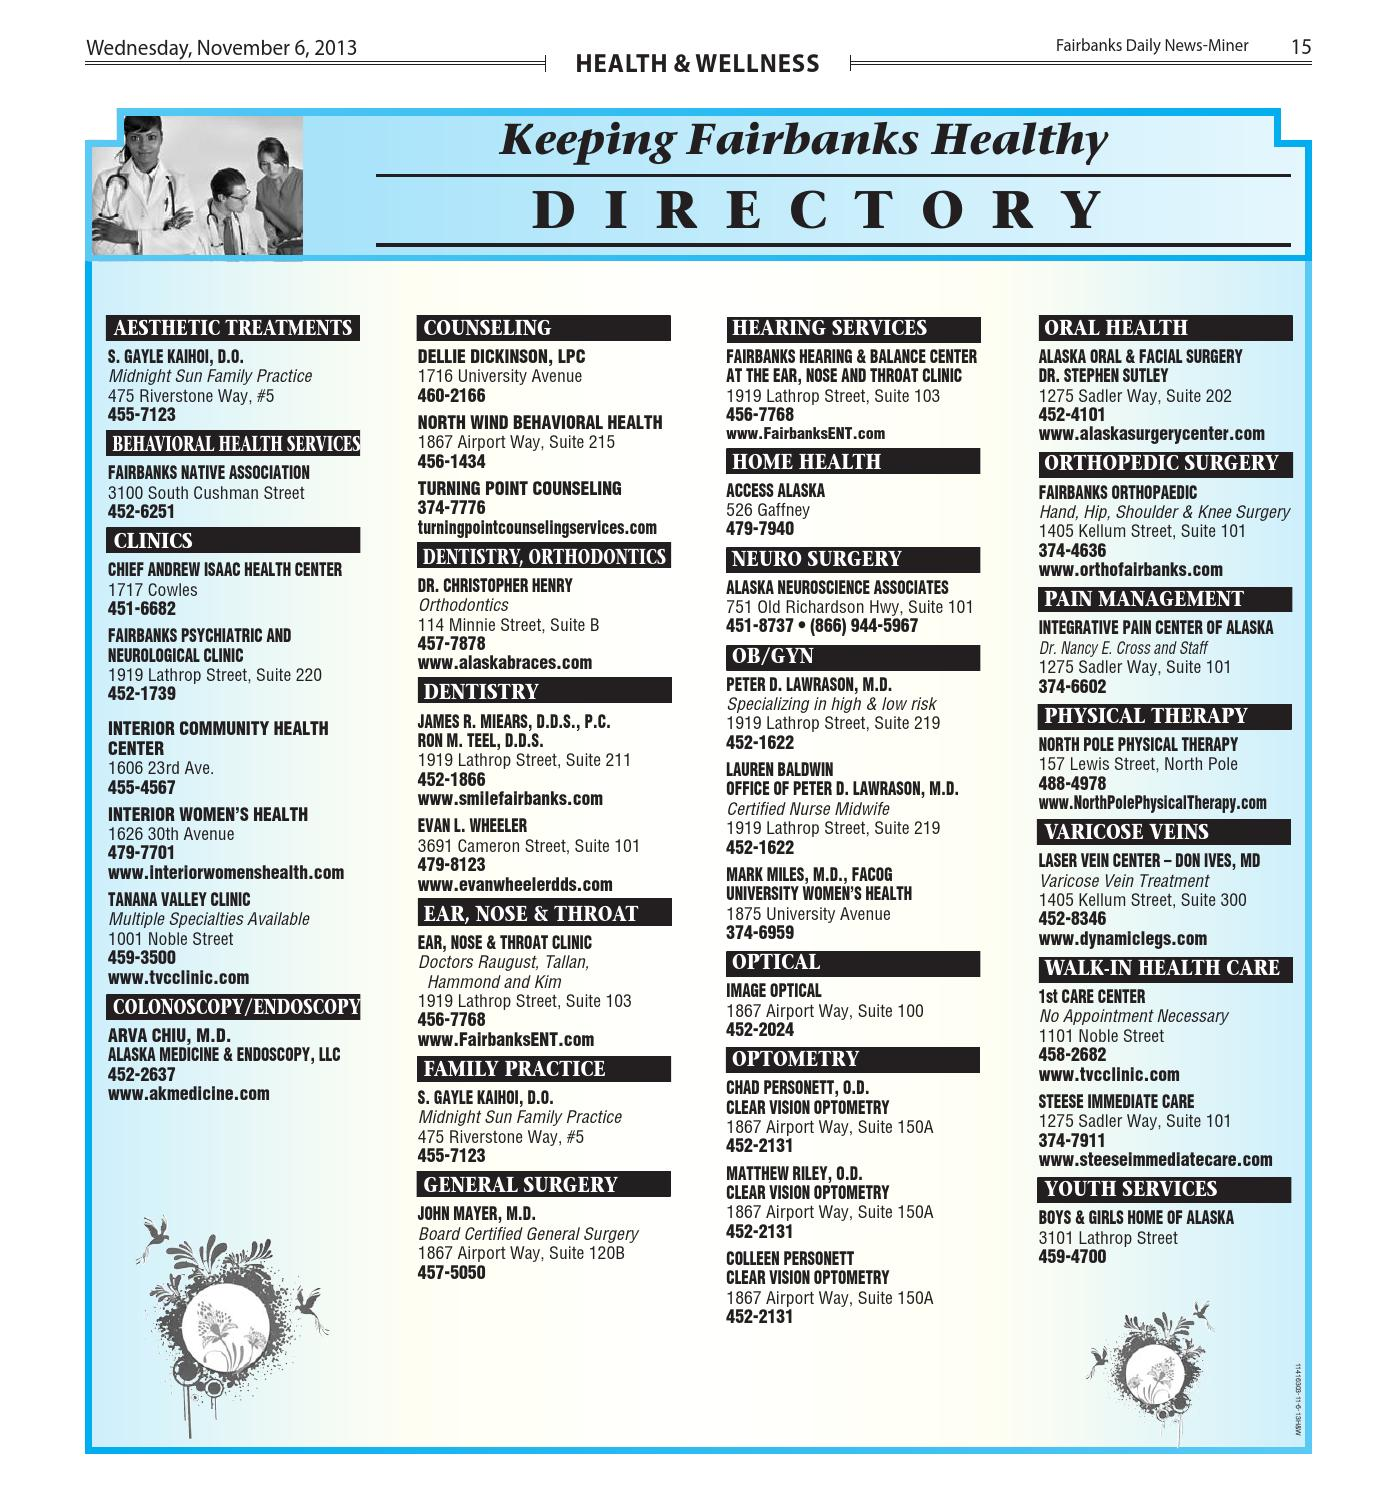 Health And Wellness Fall2013 By Fairbanks Daily News Miner Issuu